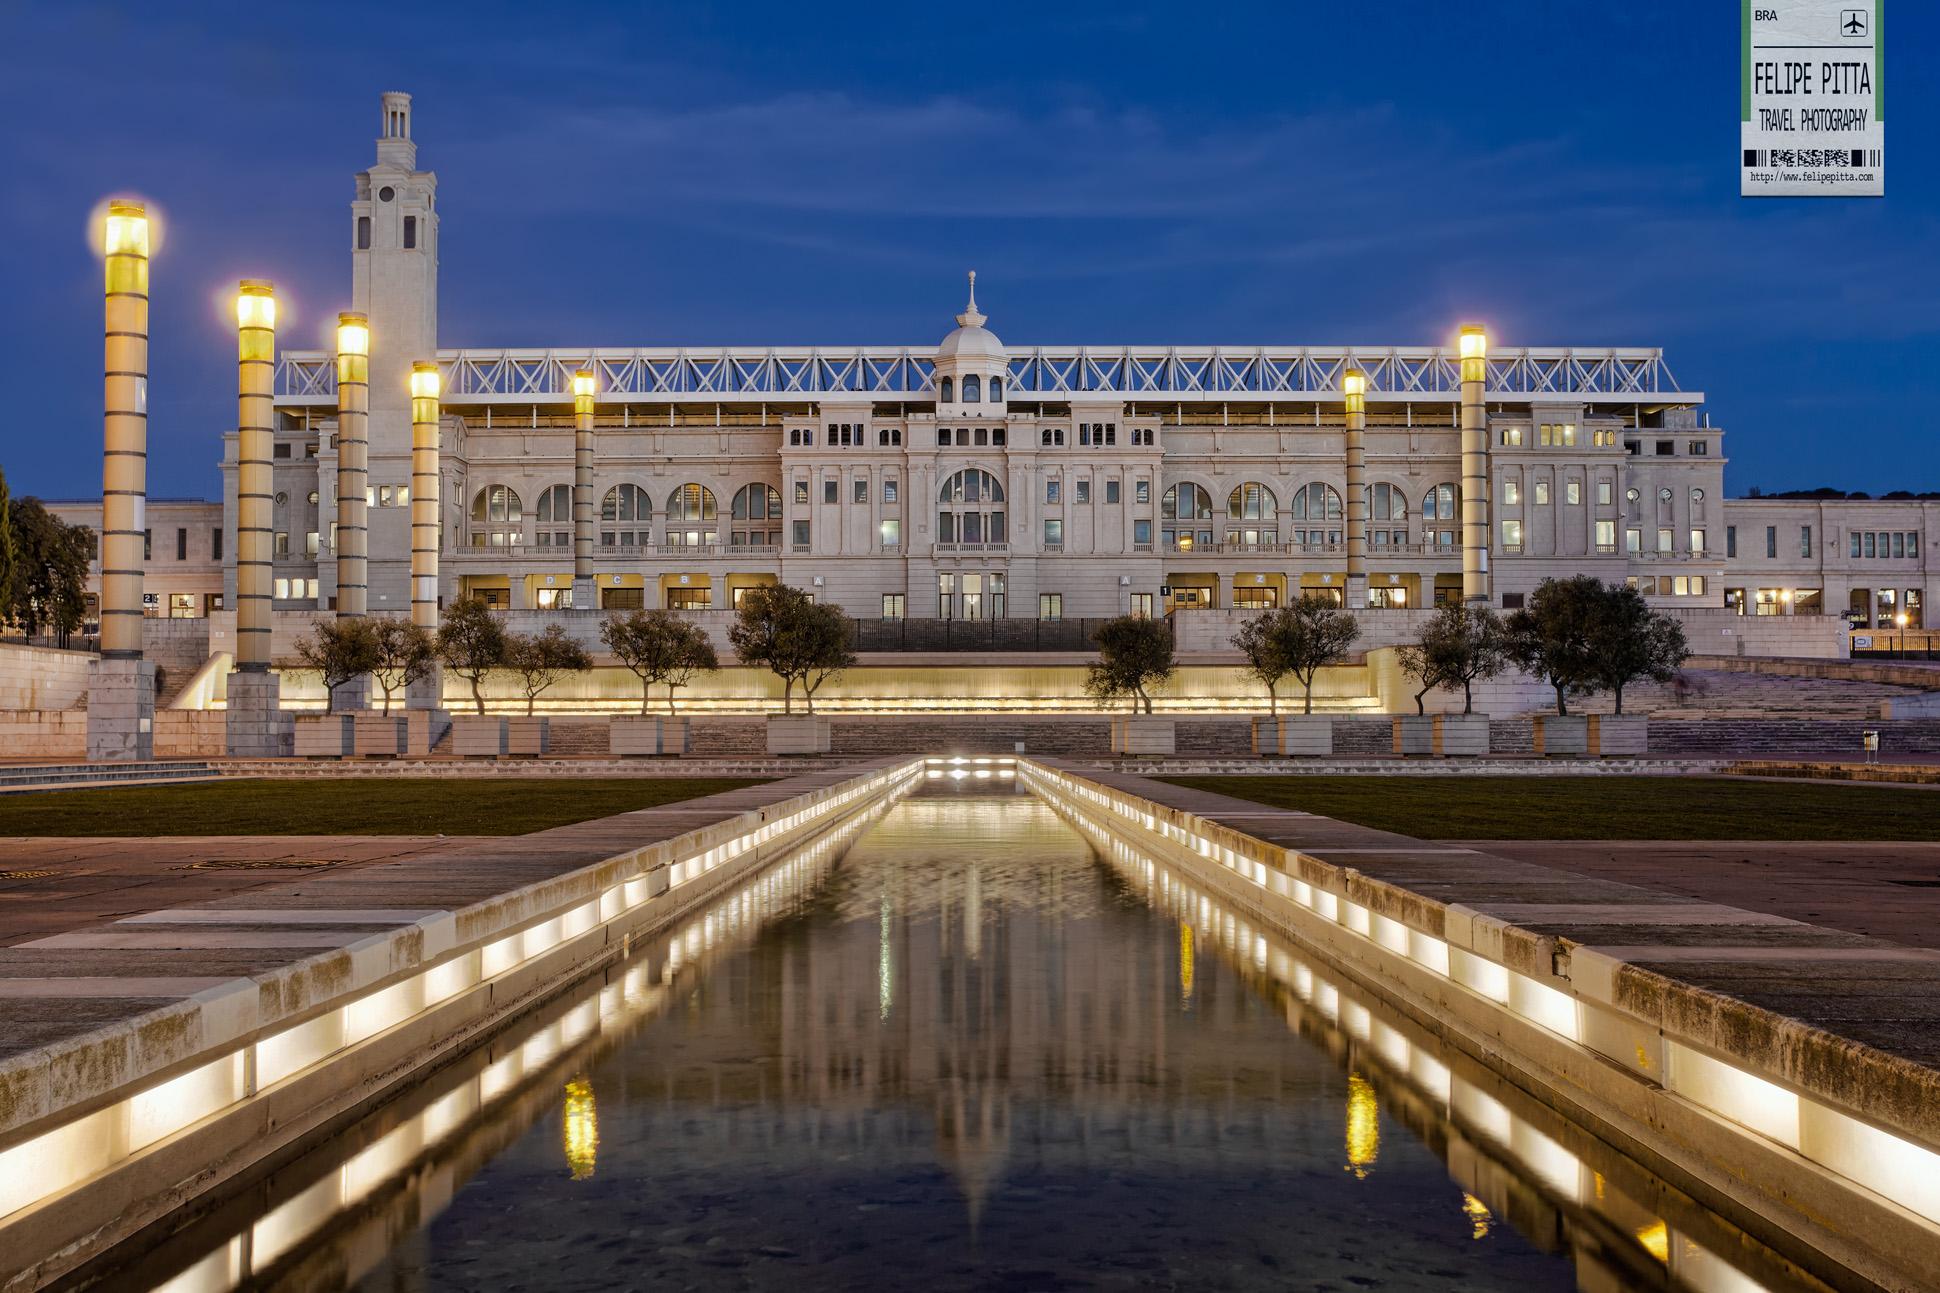 Estadi Olimpic de Montjuic Lluis Companys Facade Barcelona Catalunya Catalonia Spain